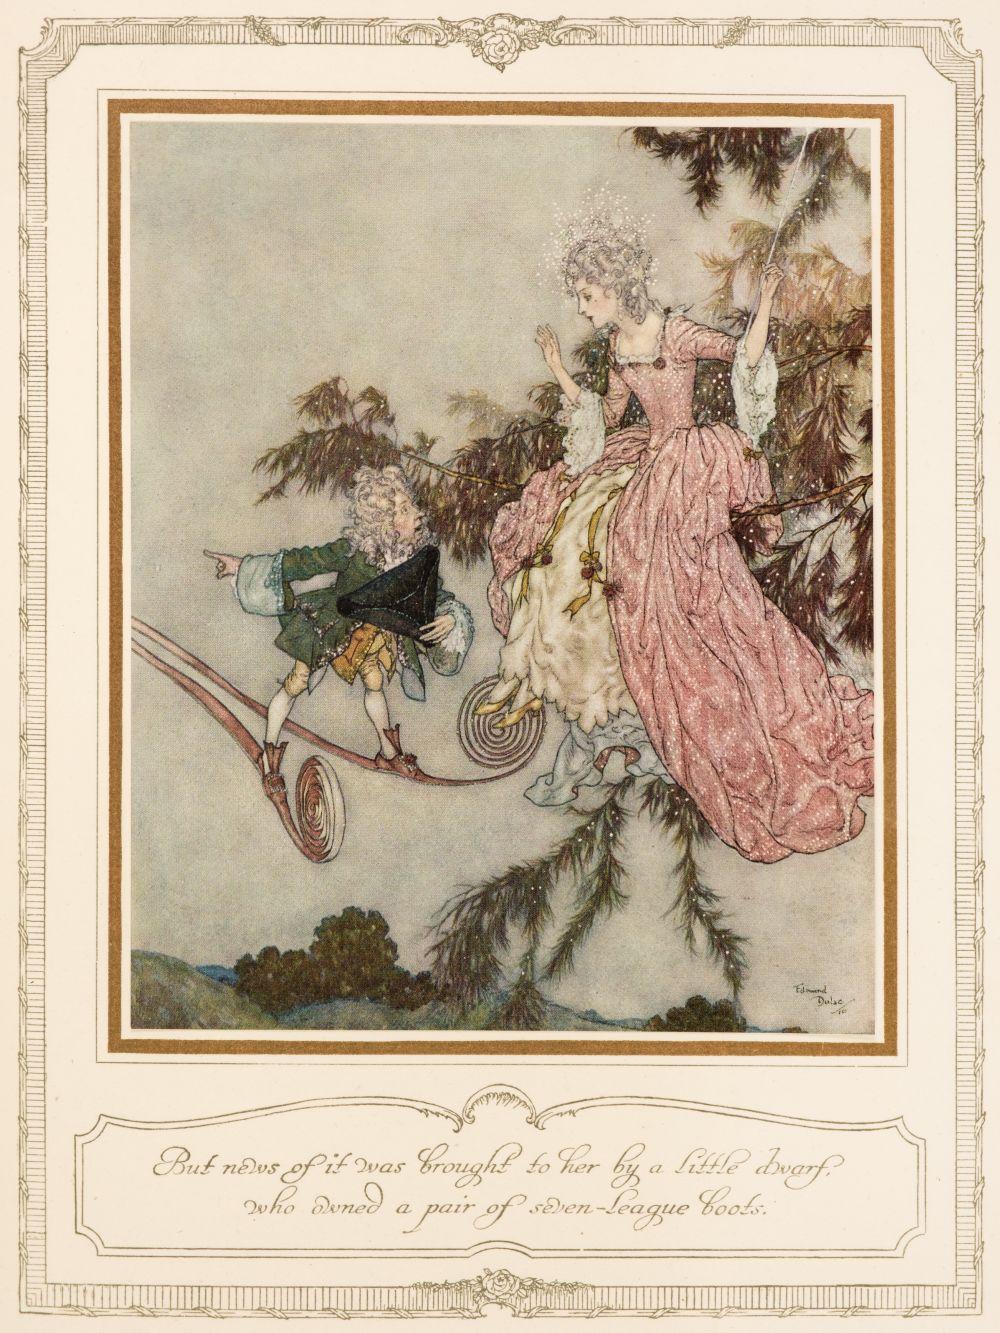 Dulac (Edmund, illustrator). The Sleeping Beauty, 1910